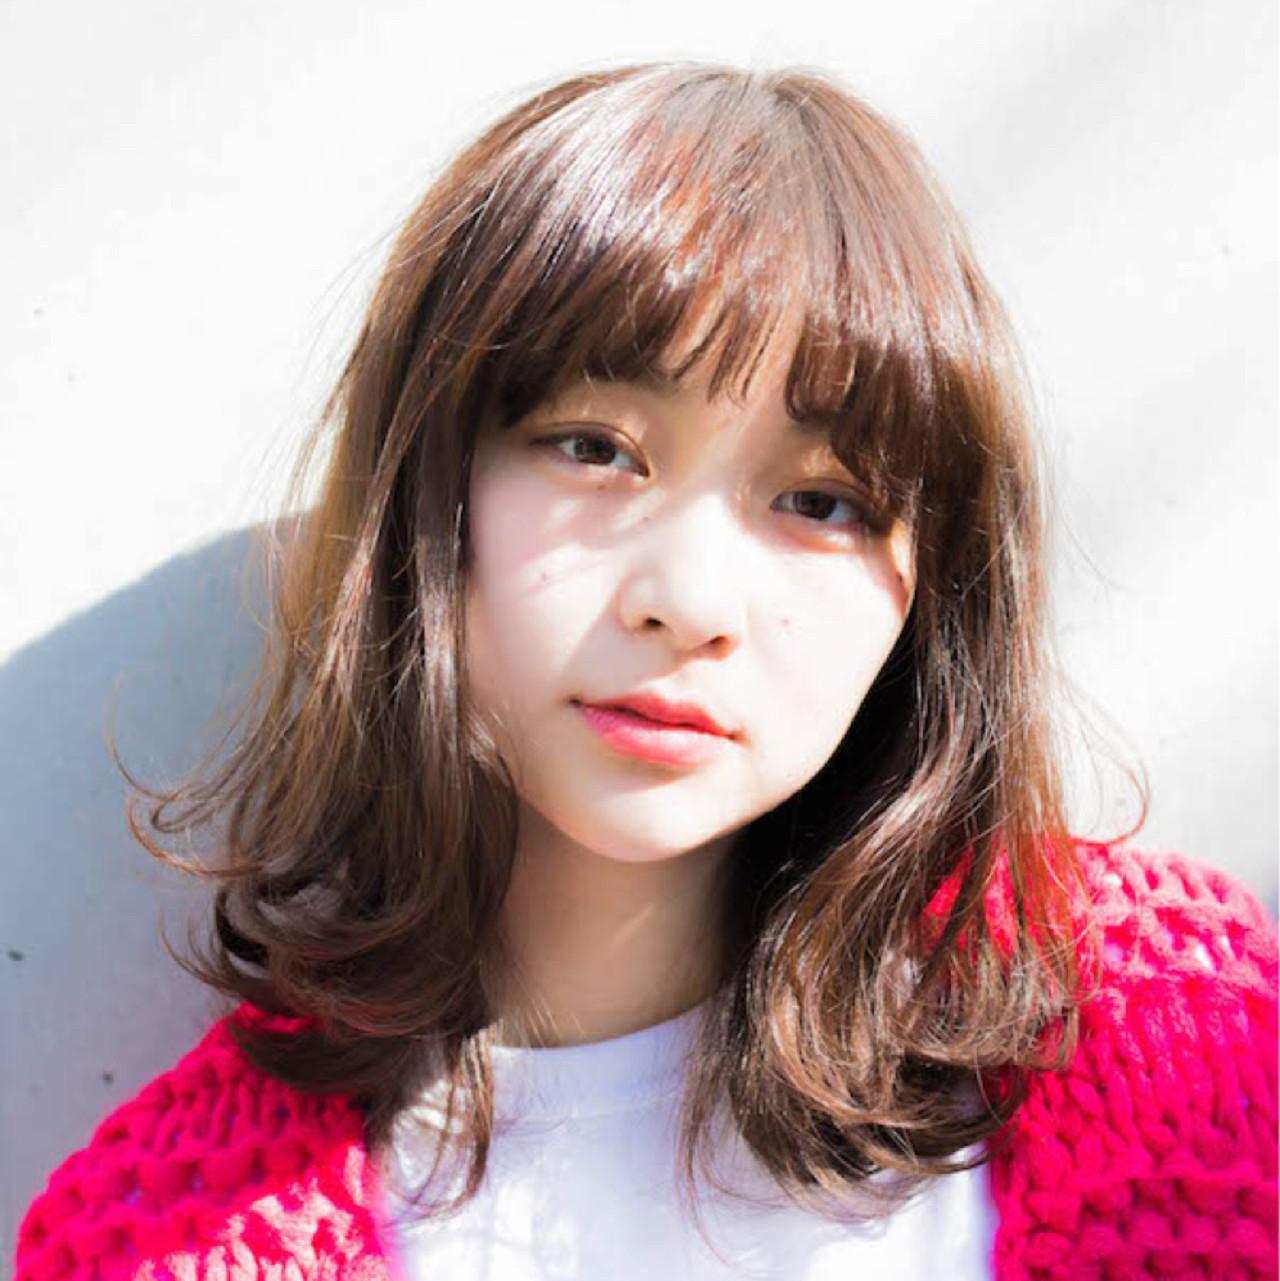 Aラインミディアムで大人可愛く♡ 竹澤 優/relian銀座 | relian銀座